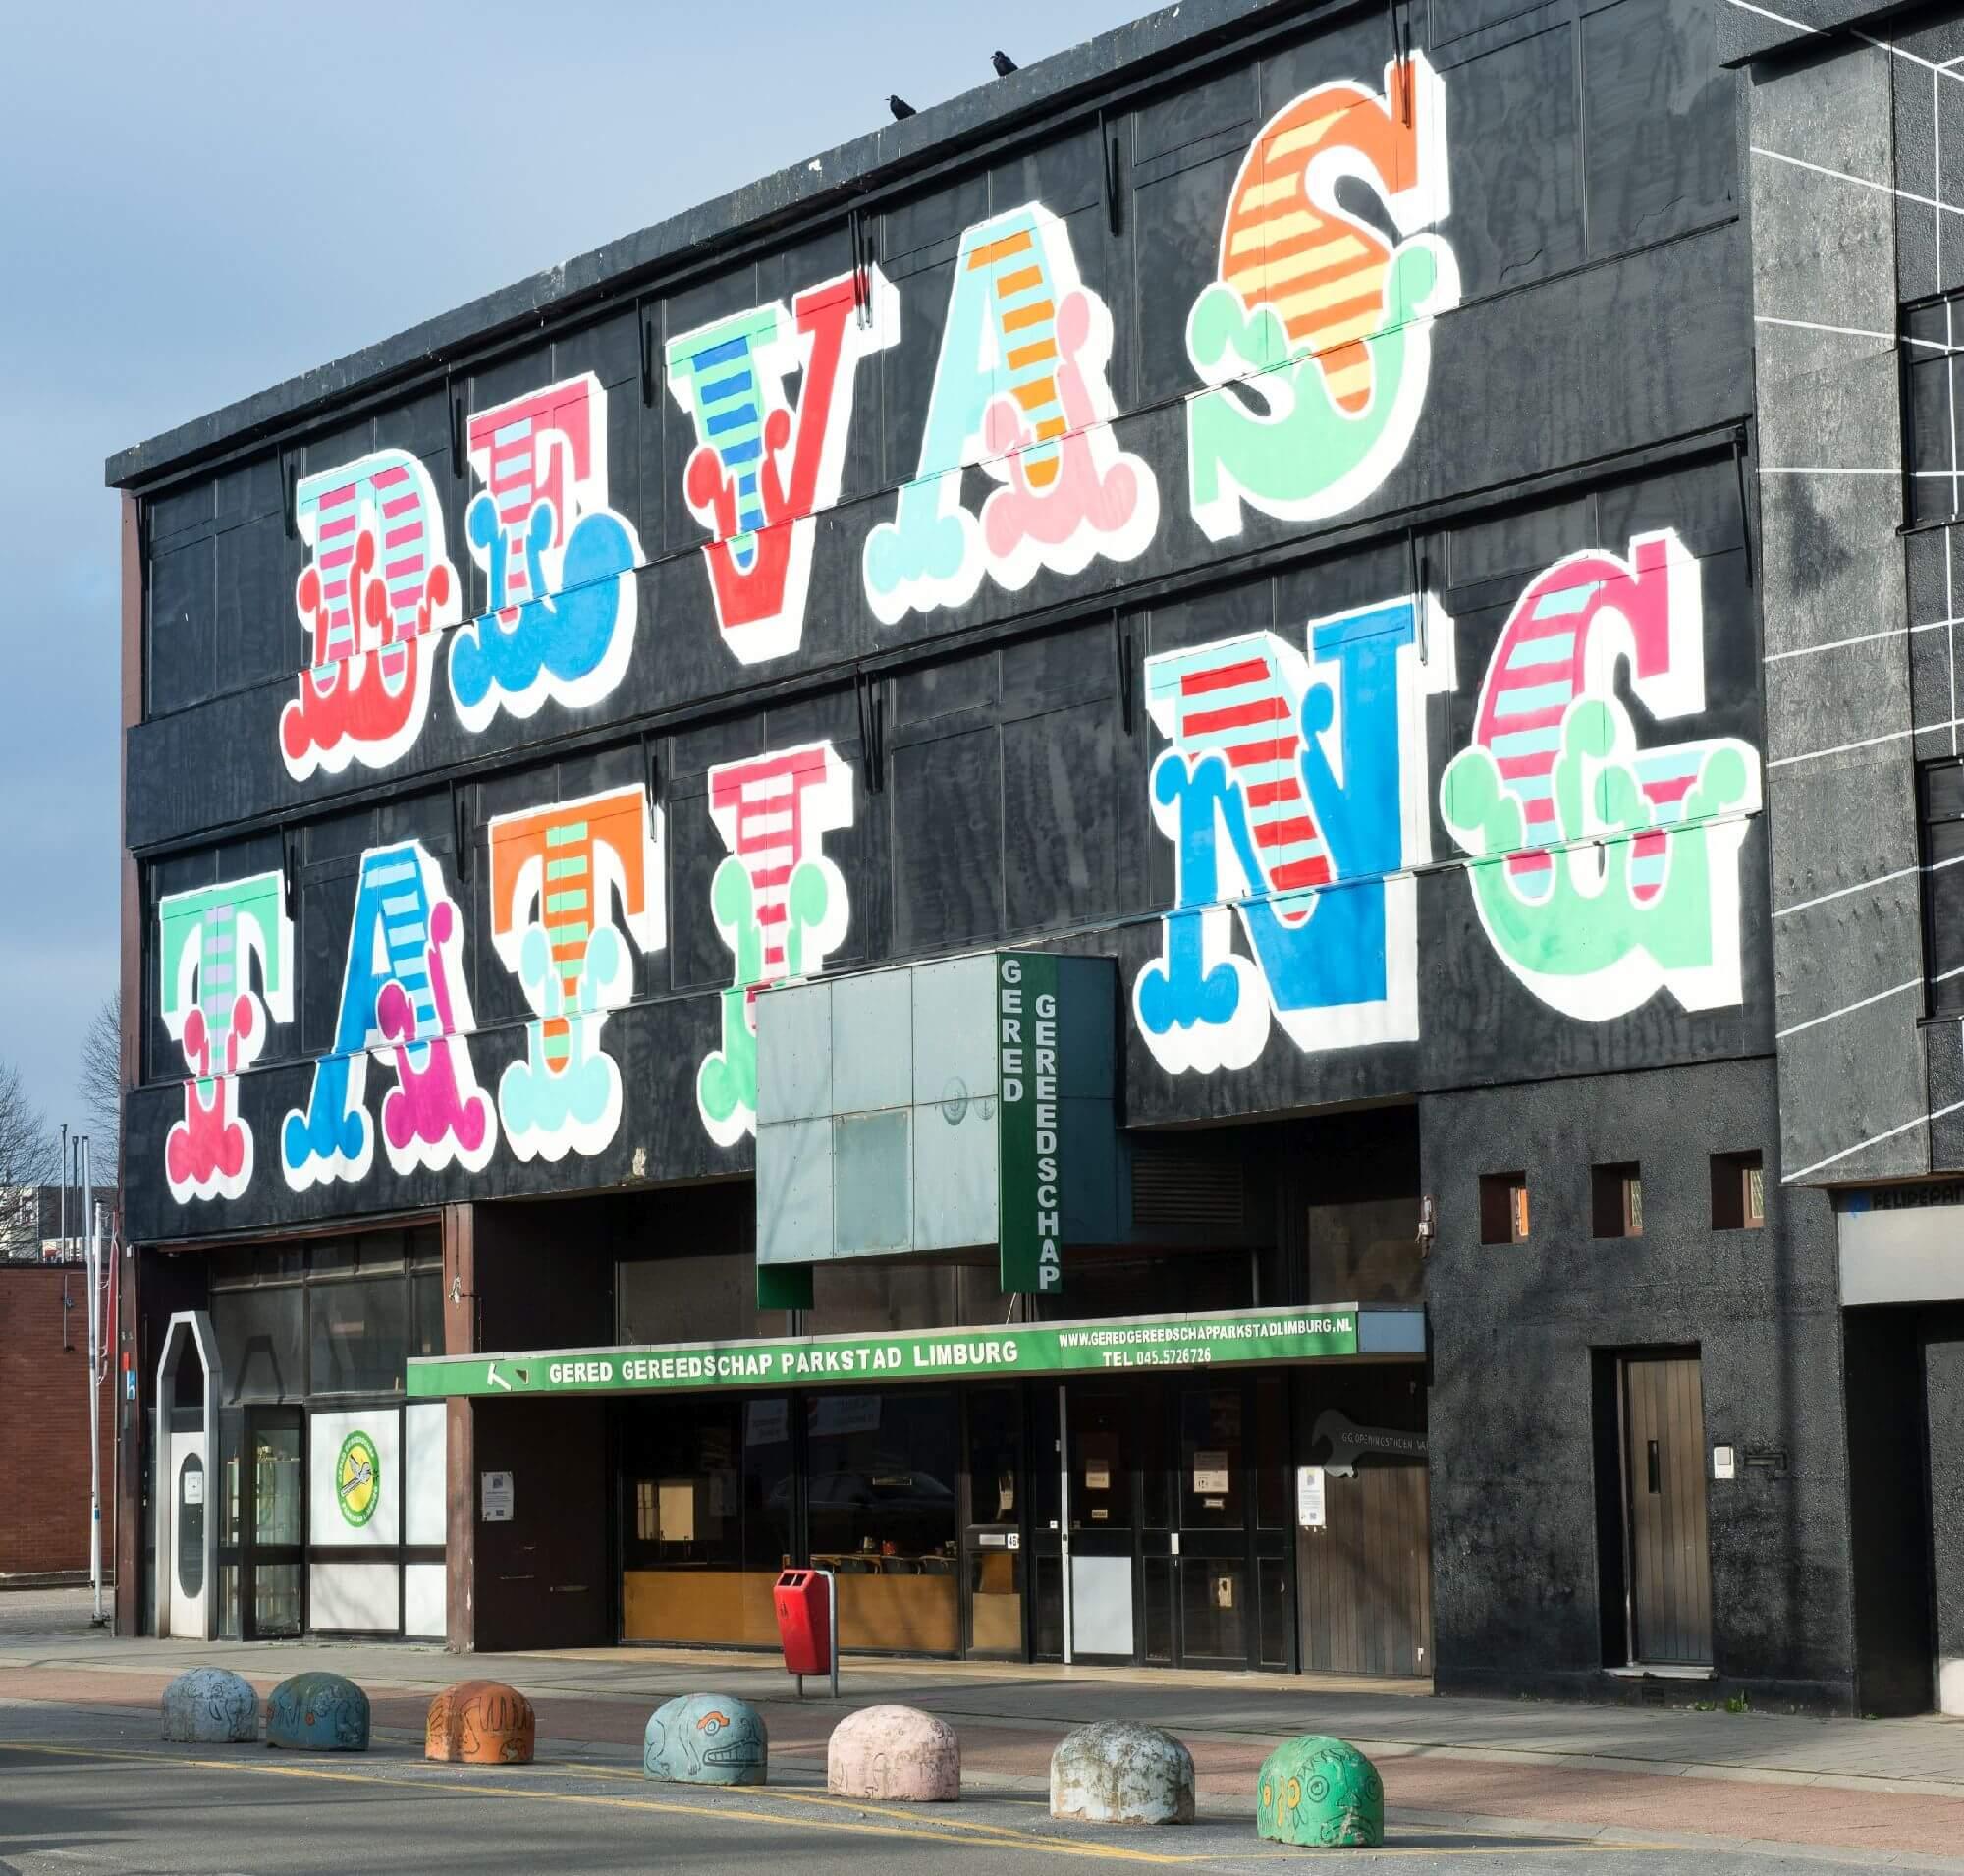 Mesta mestom #5: Urbana prenova s poslikavo fasad